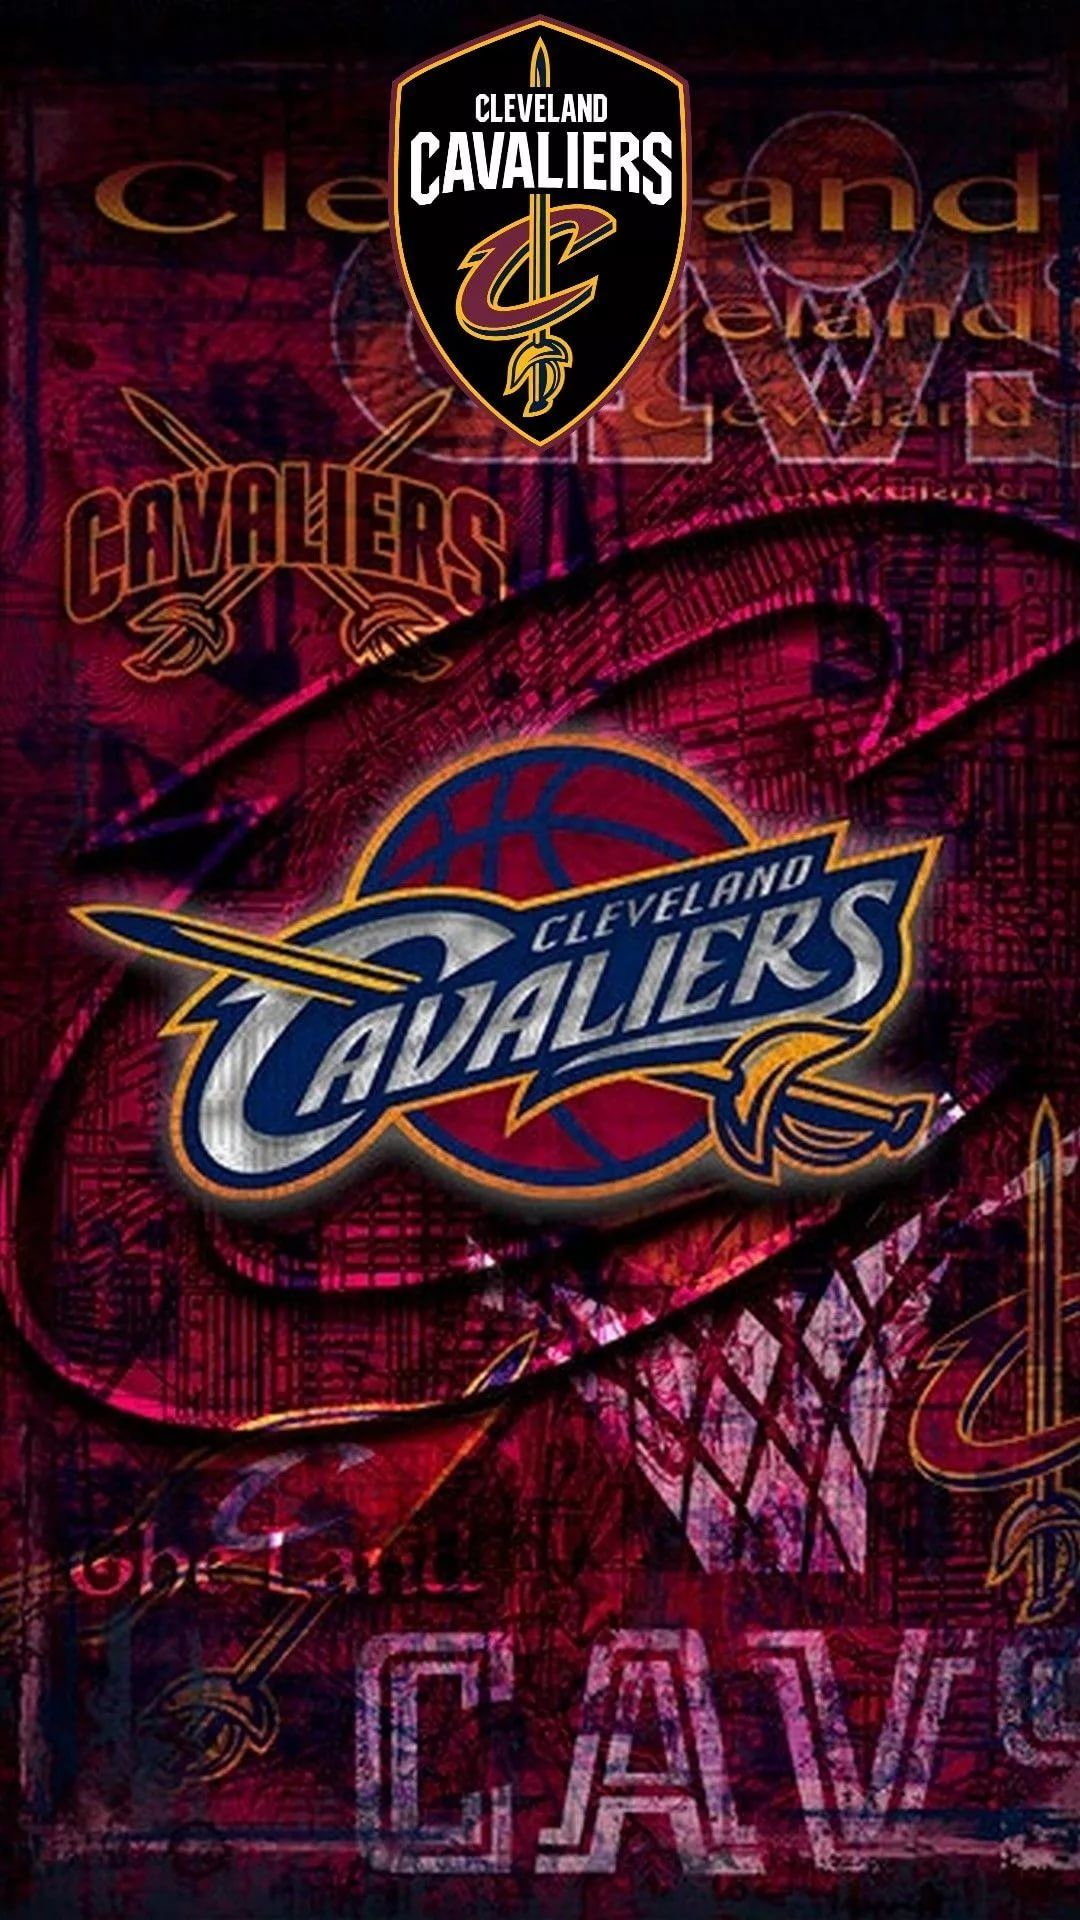 Cleveland Hd iPhone 5 wallpaper